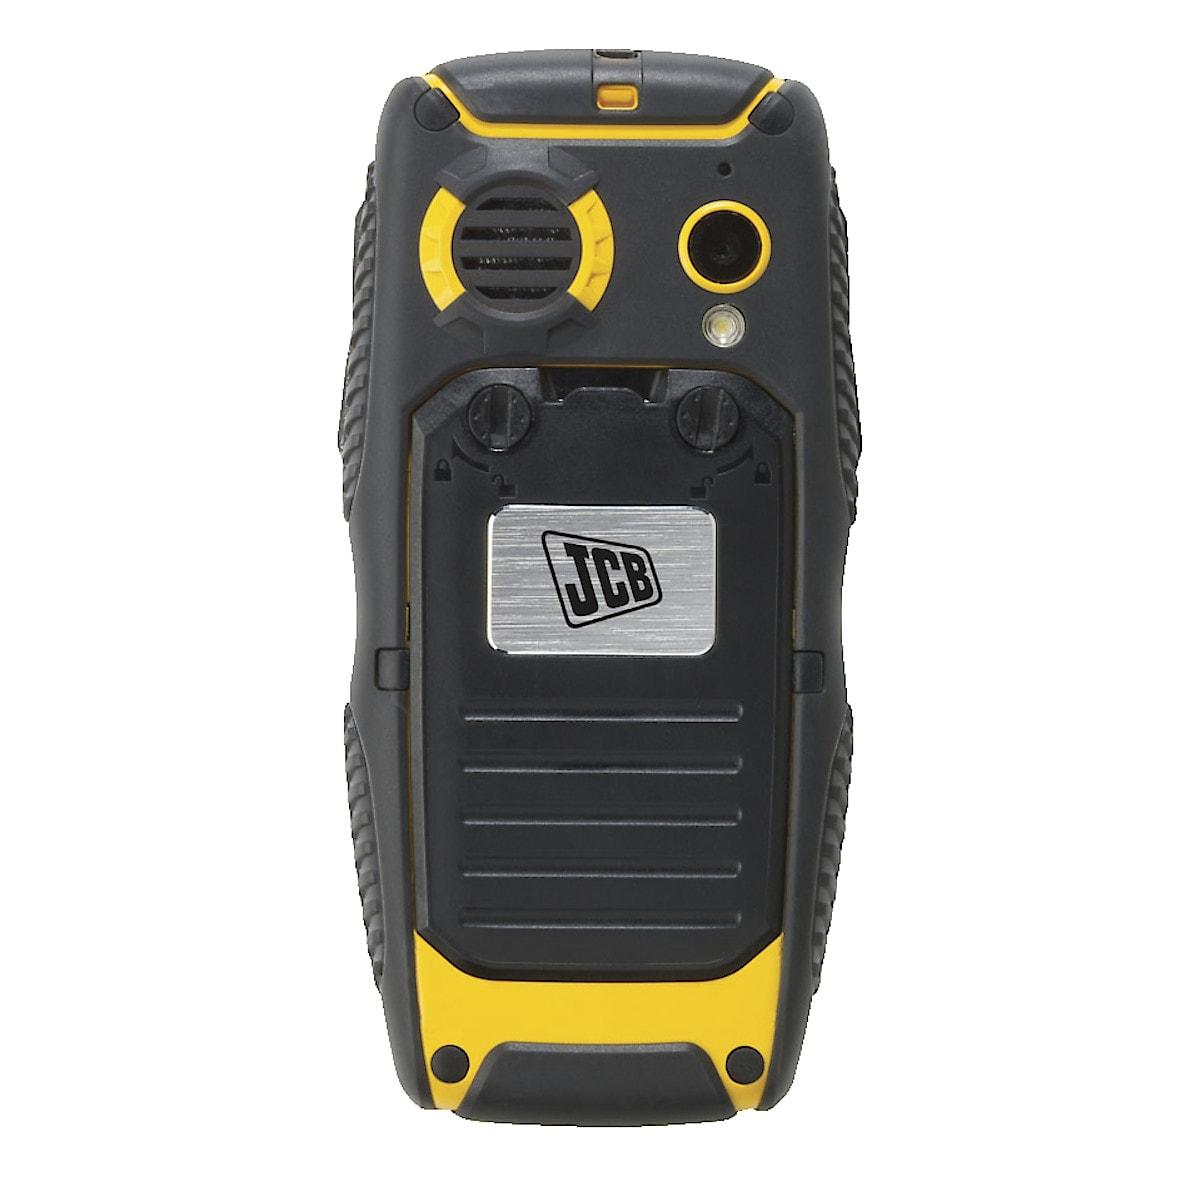 Matkapuhelin JCB Toughphone Pro-Talk